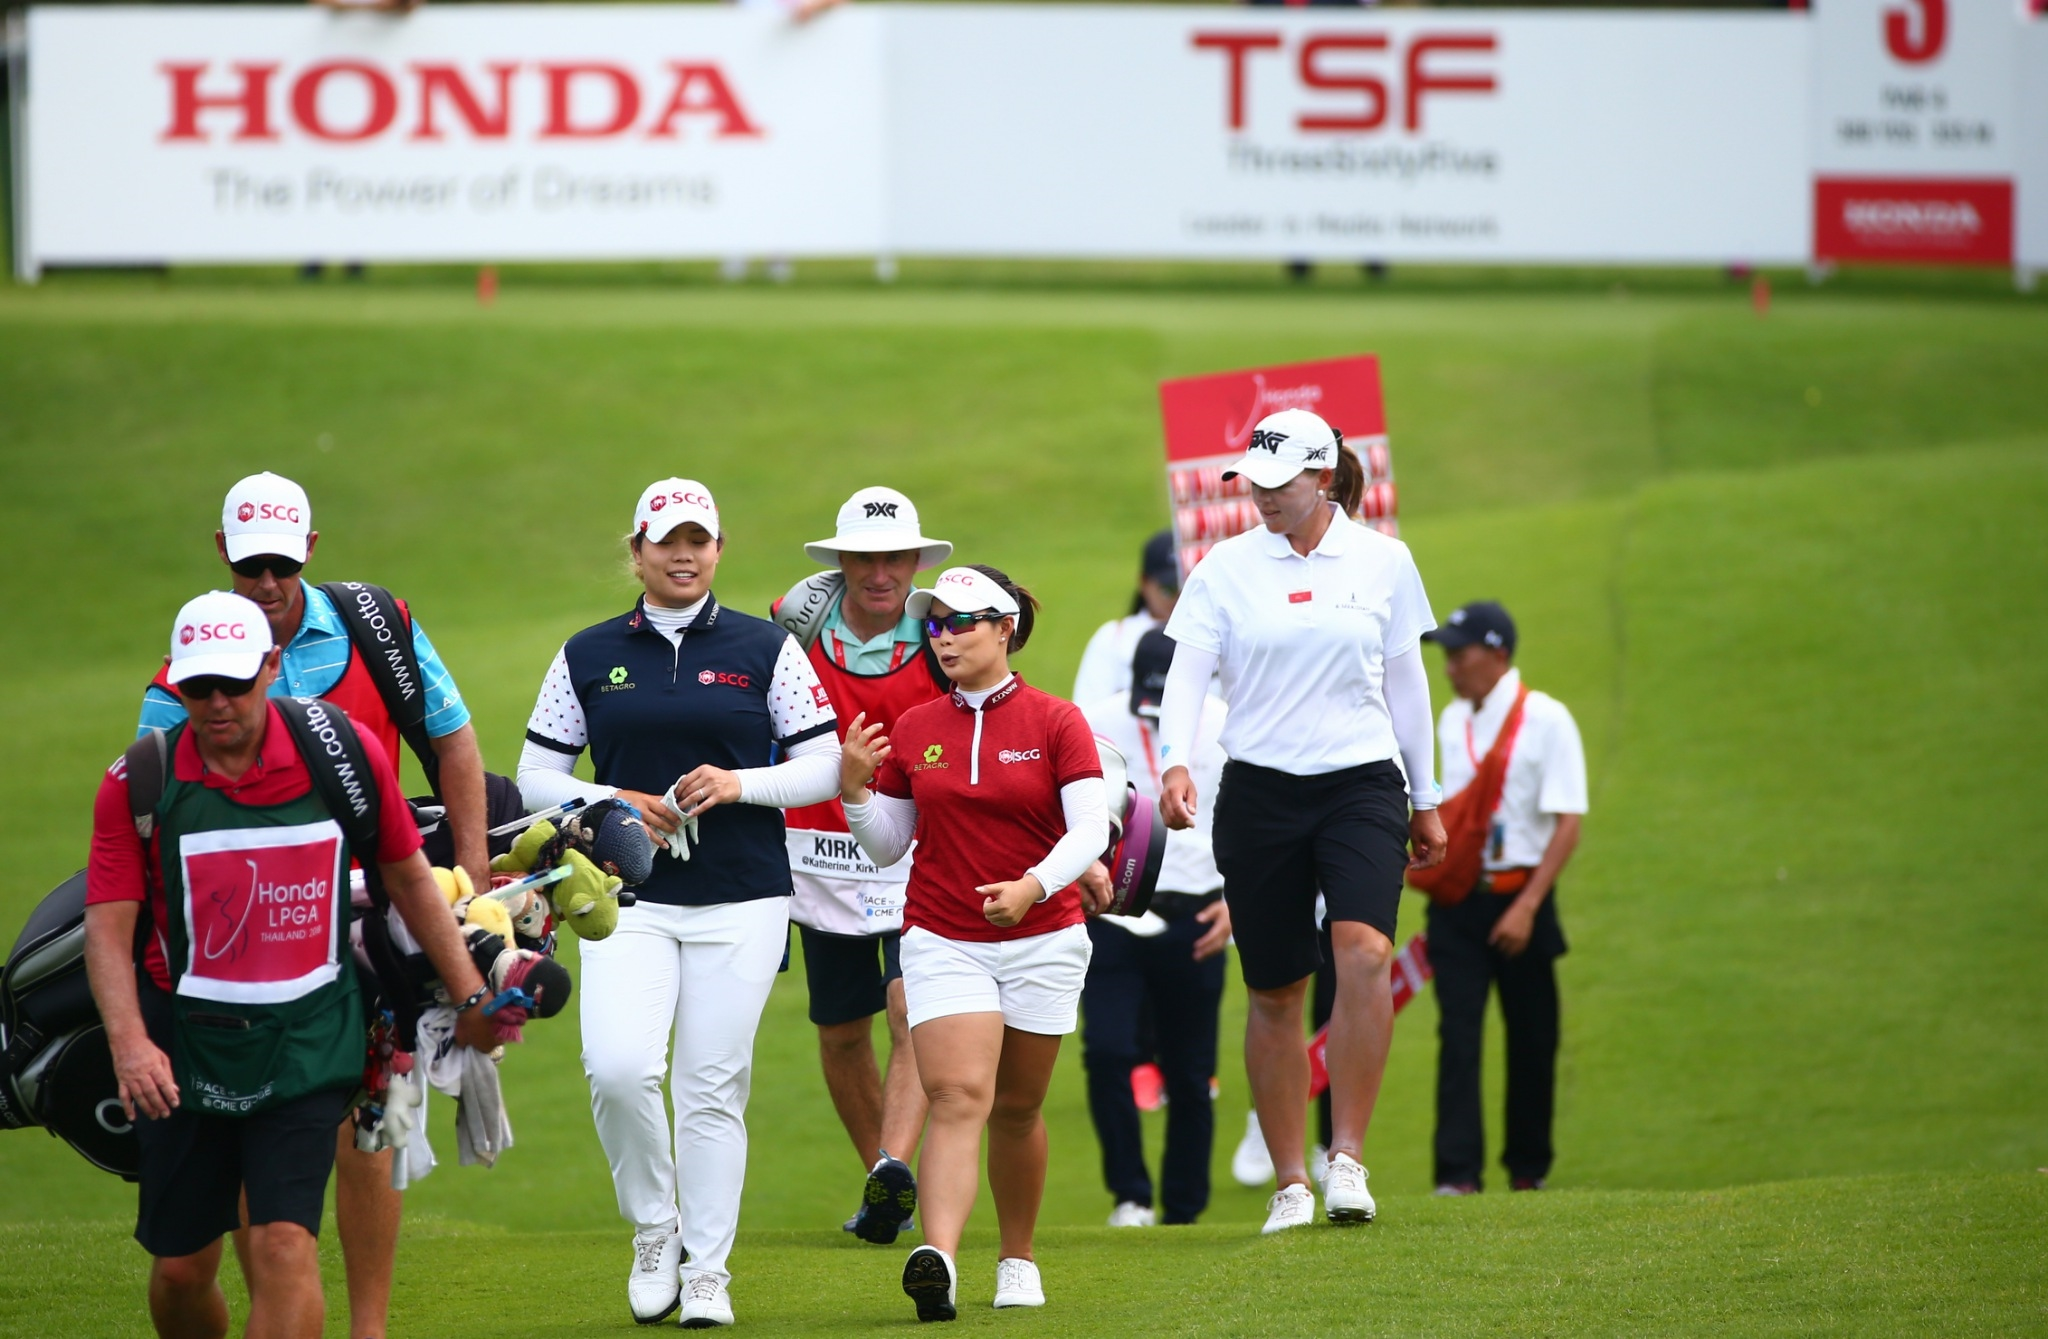 golfdigg_golfdiggTODAY_moriya_Ariya_honda_lpga_thailand_2019